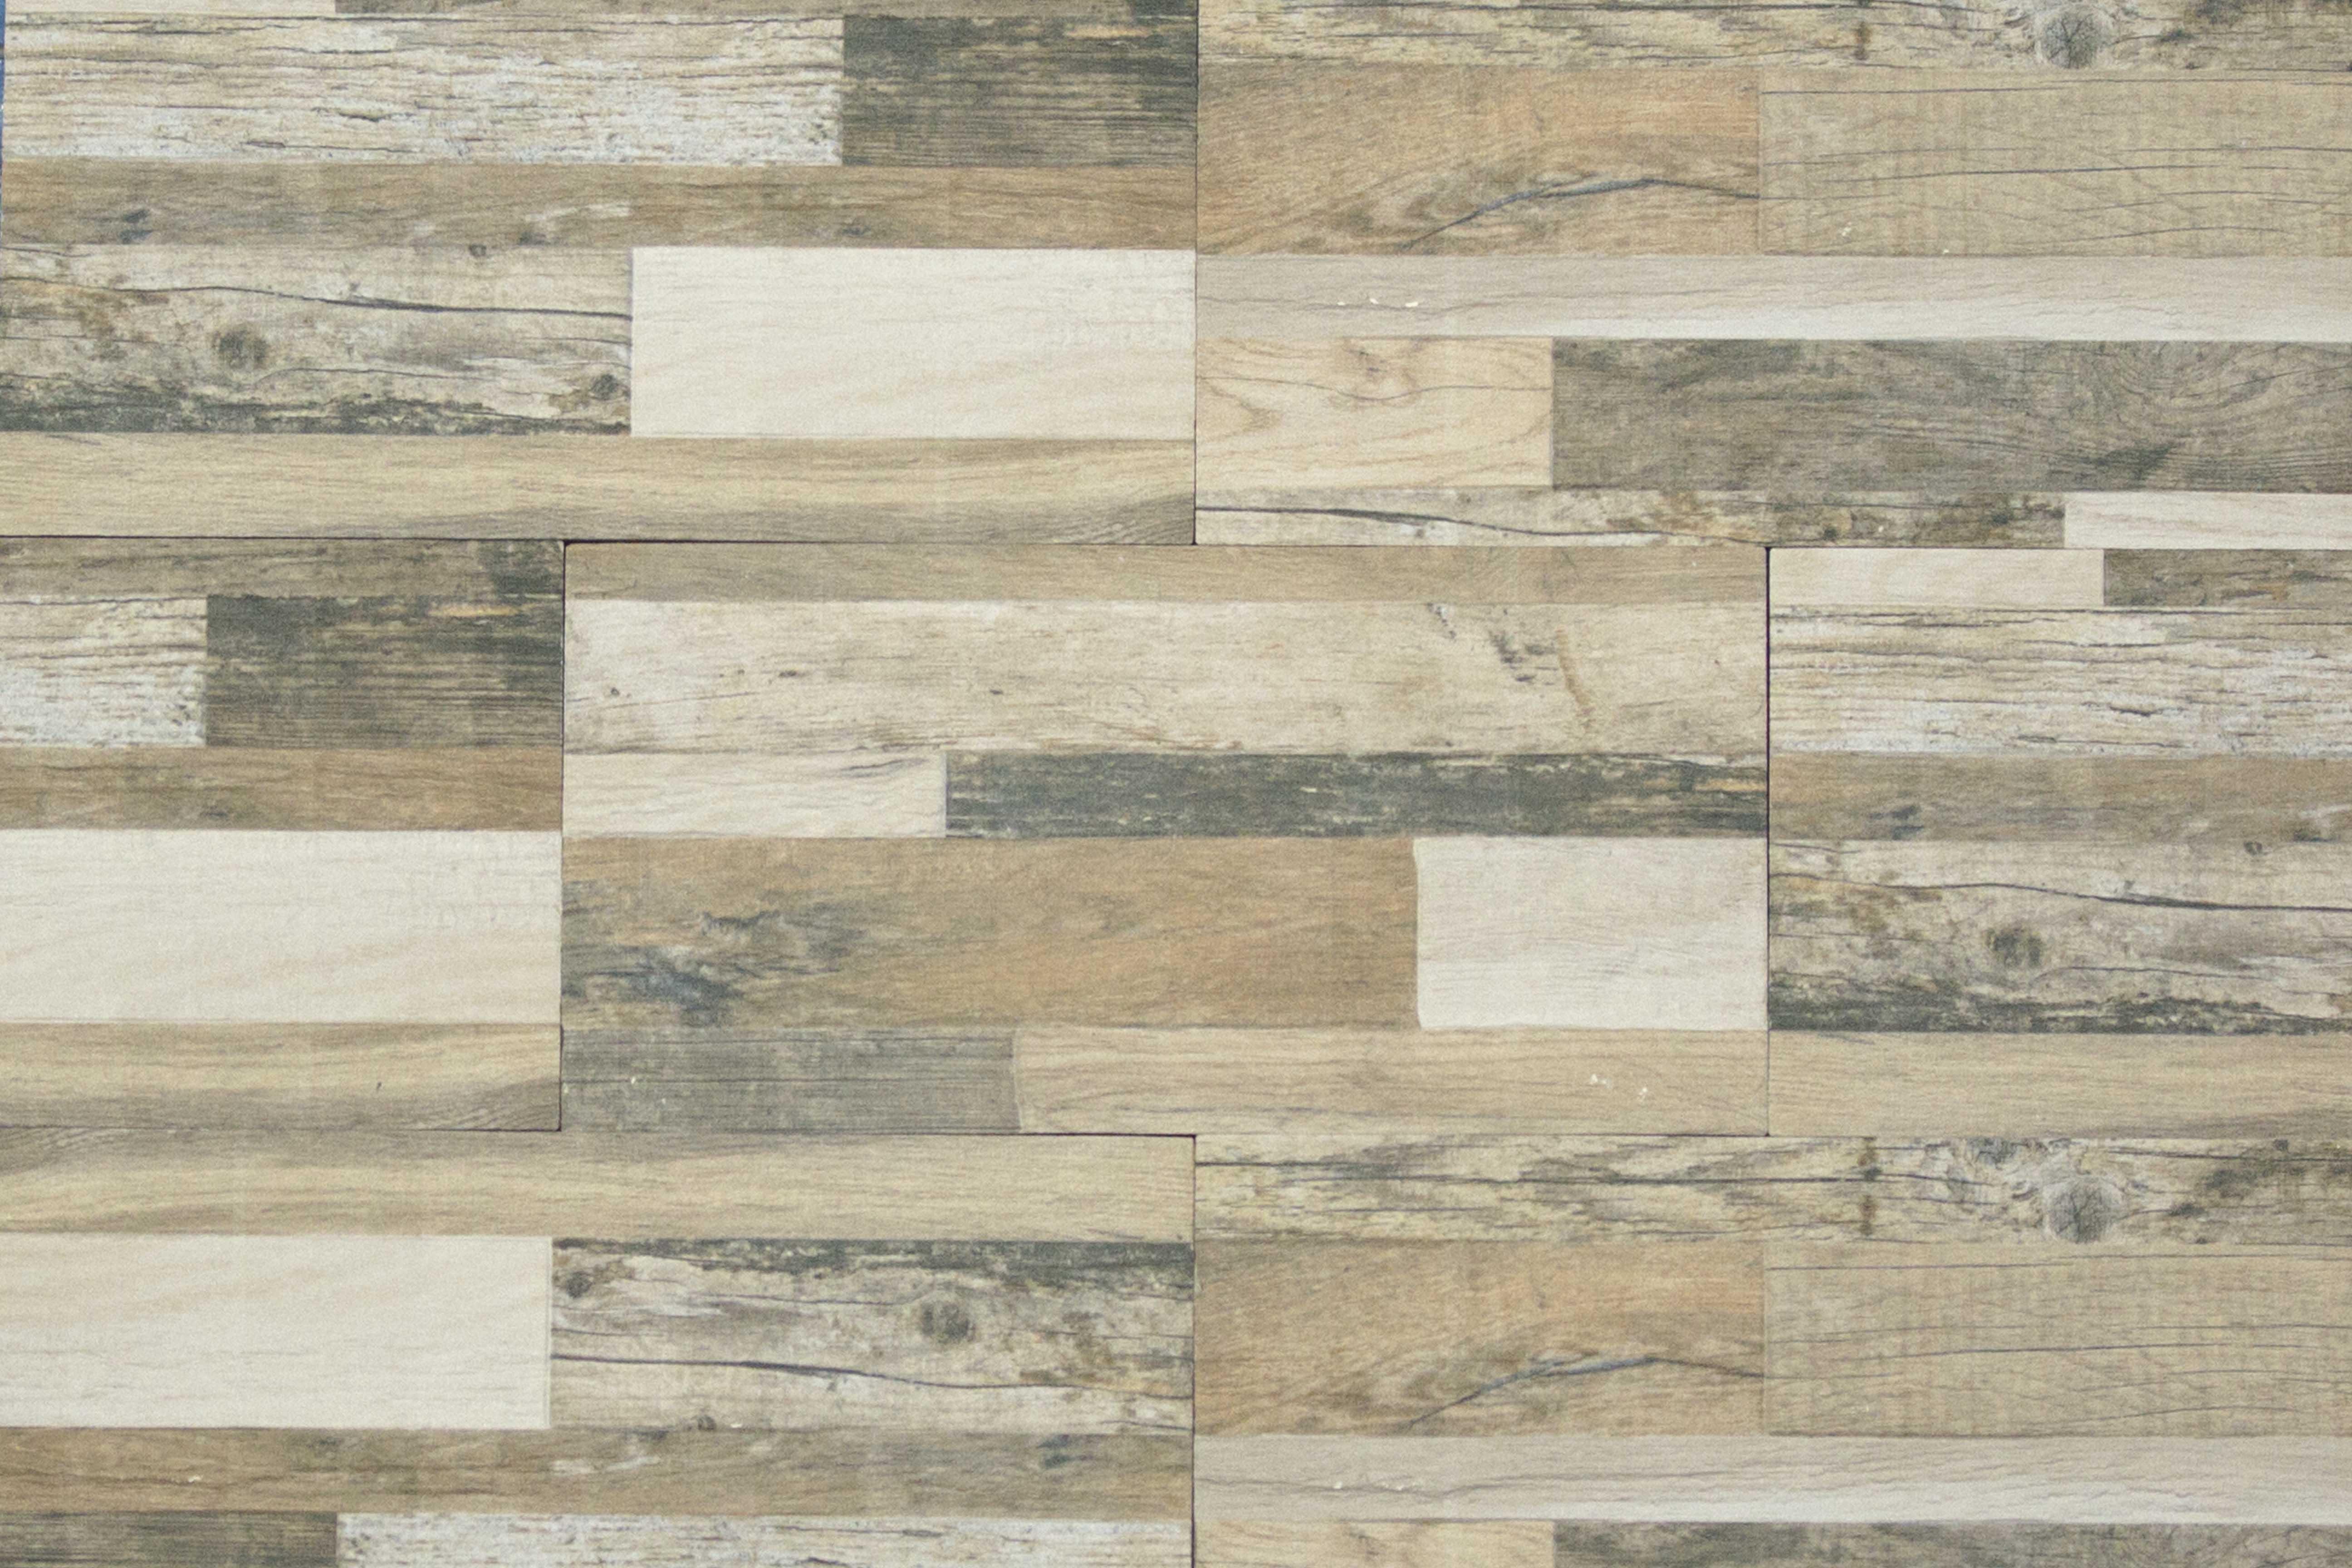 MBI | Muro Ornamento Pavéwall Wood 11x45 | Brown